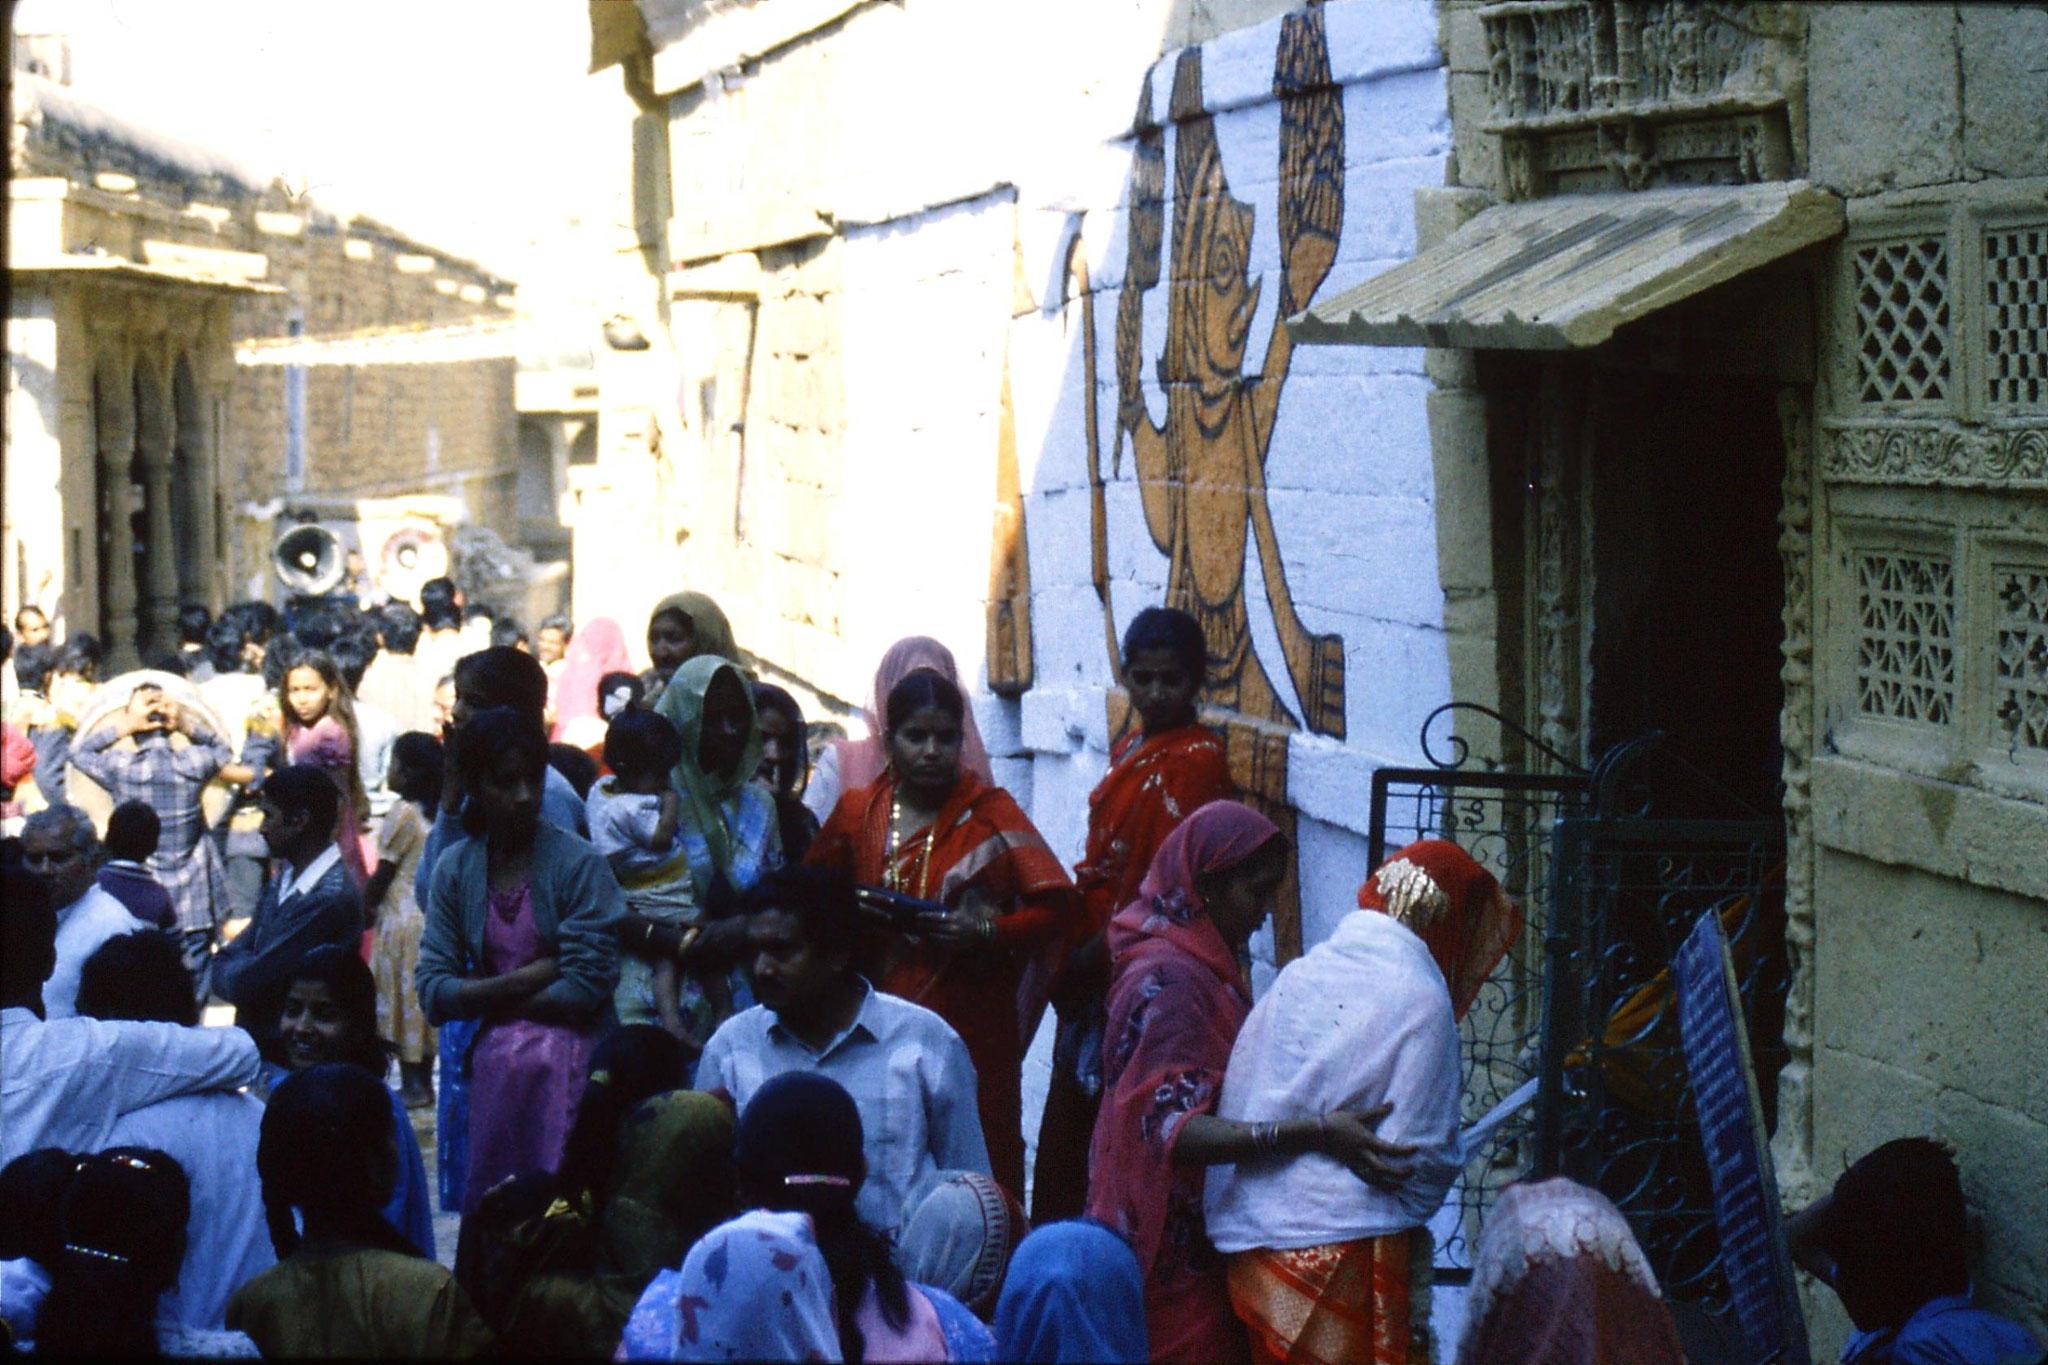 3/12/1989: 6: Jaisalmer wedding procession